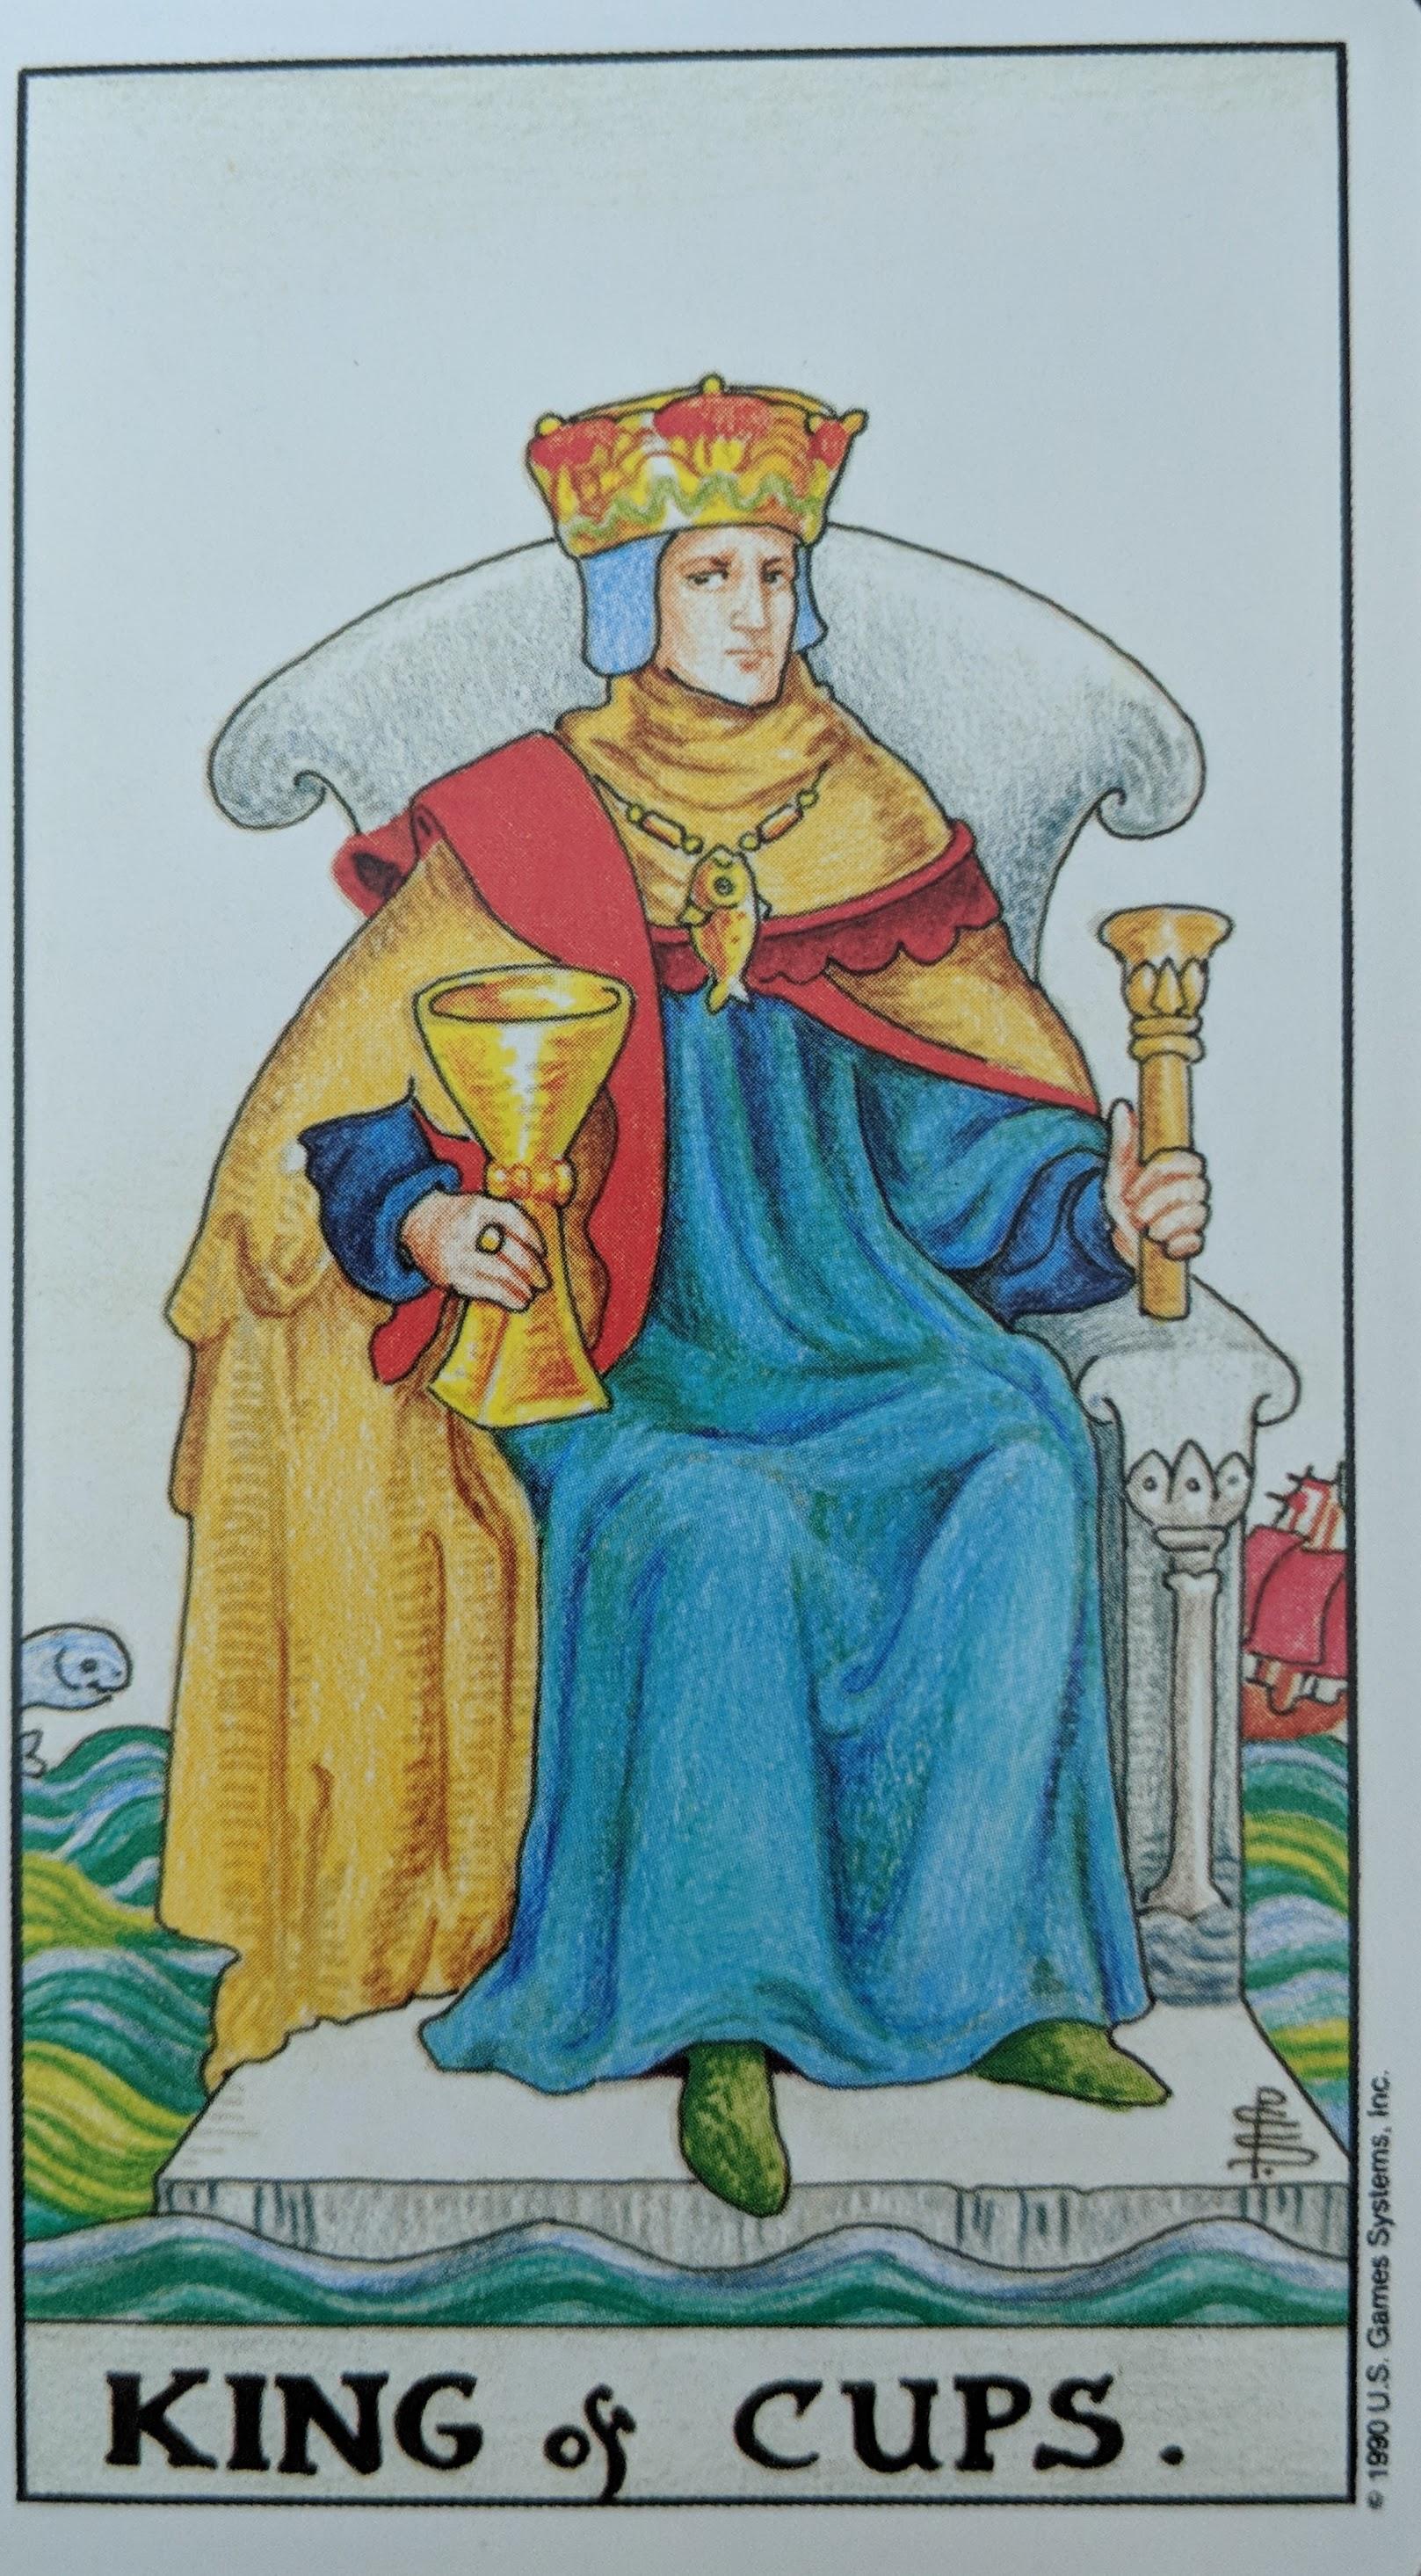 king of cups tarot card.jpg